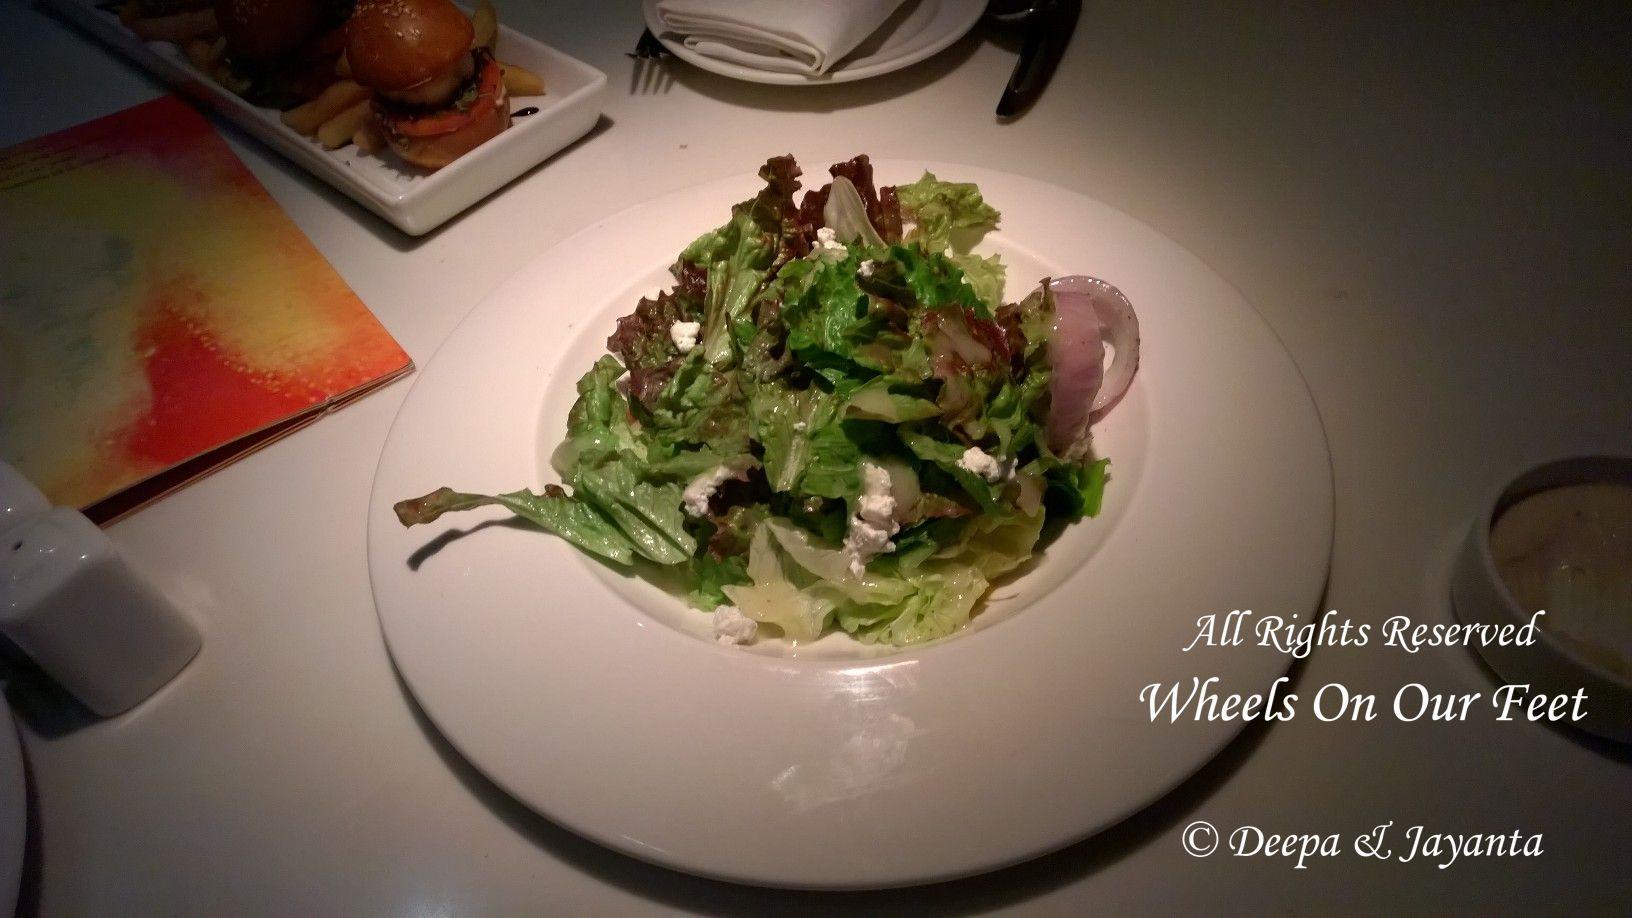 Restaurant Review: Café Infinito in BKC, Mumbai